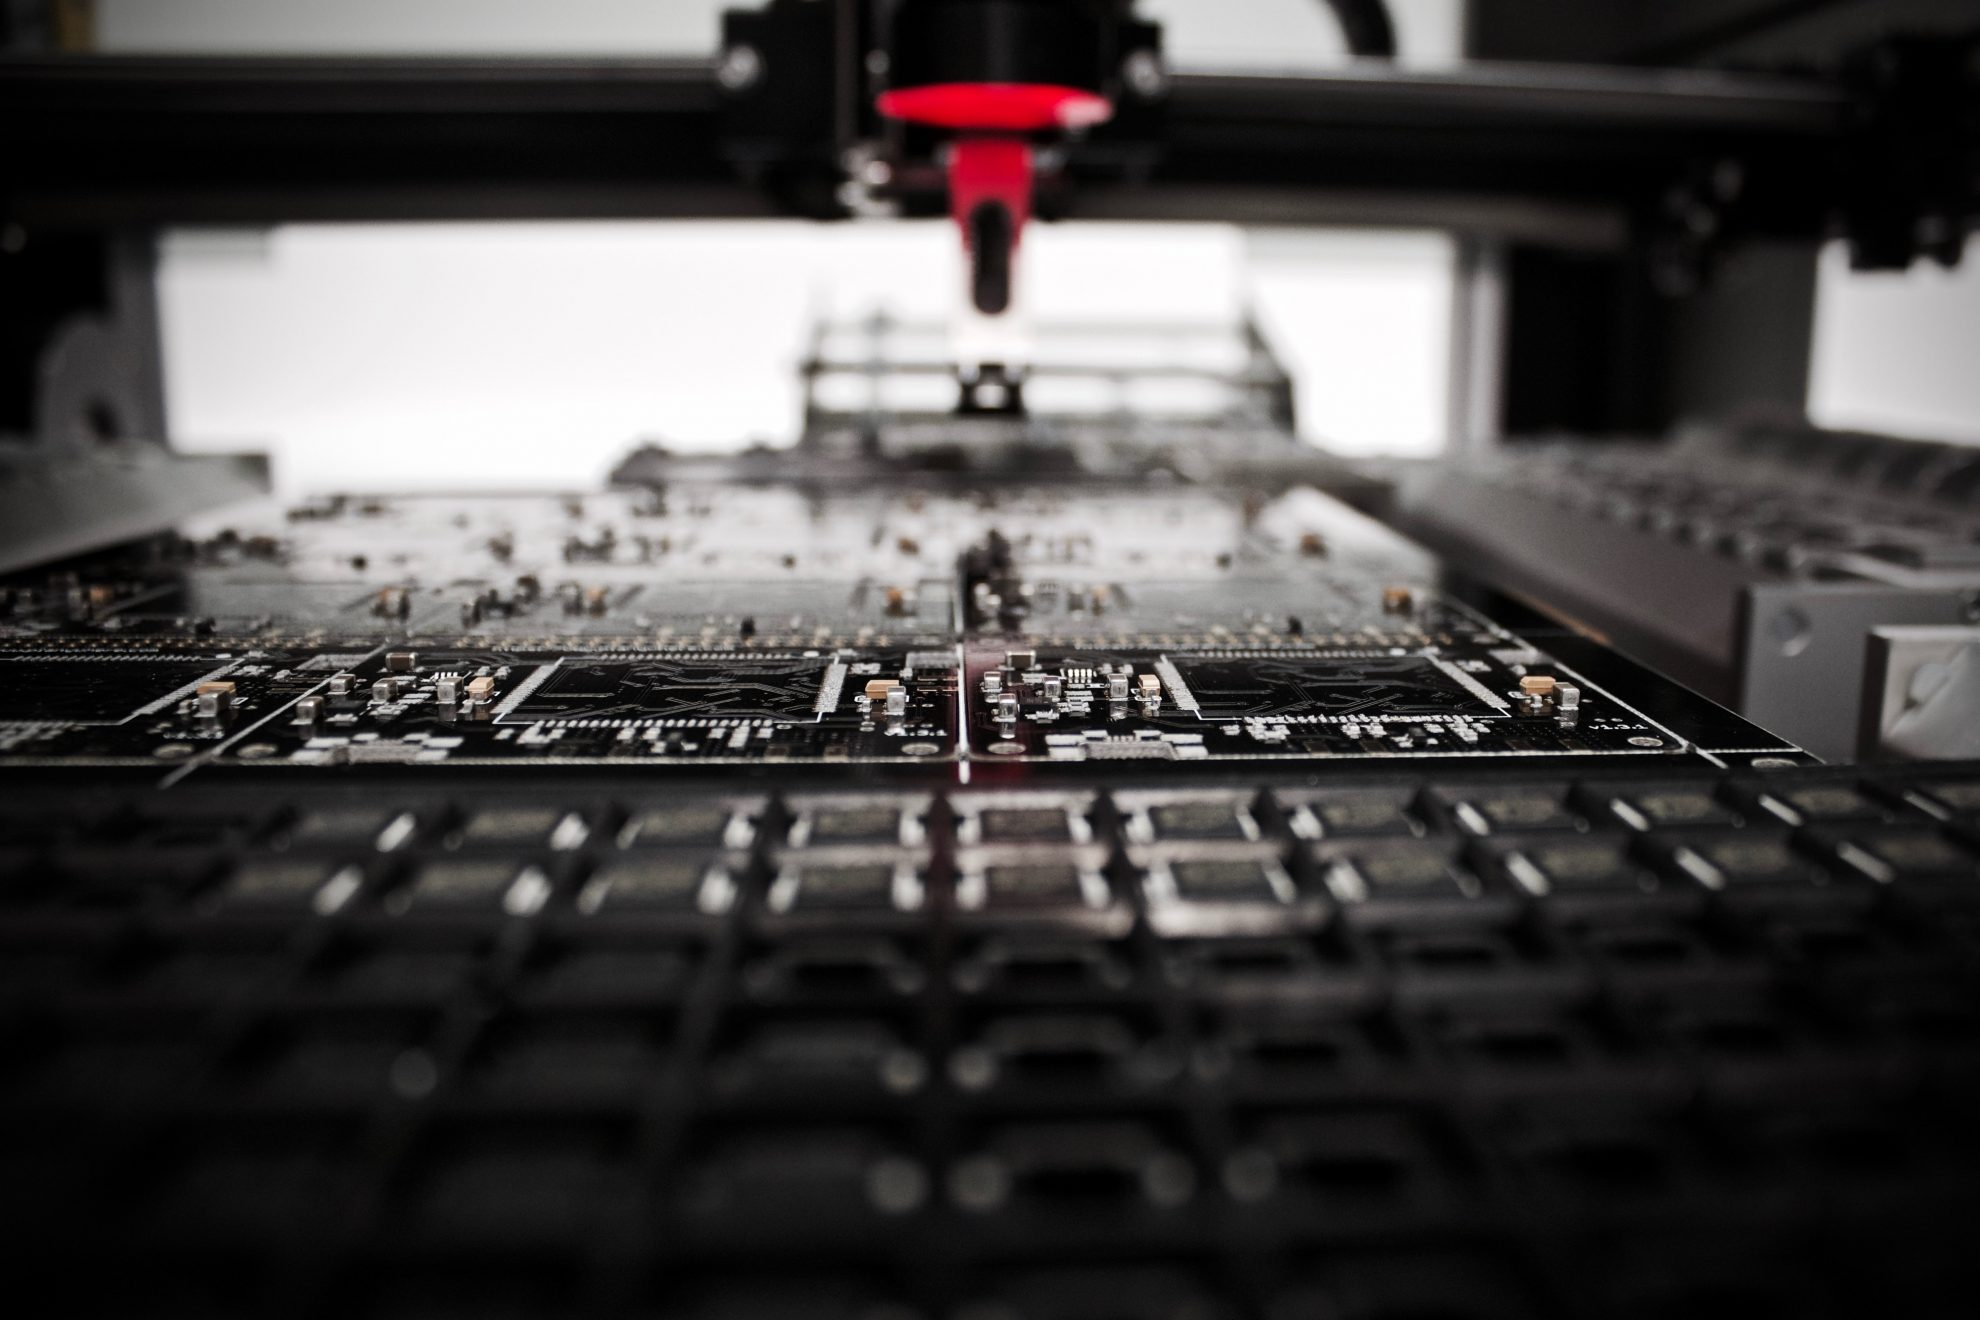 robotics fabrication boards transistors